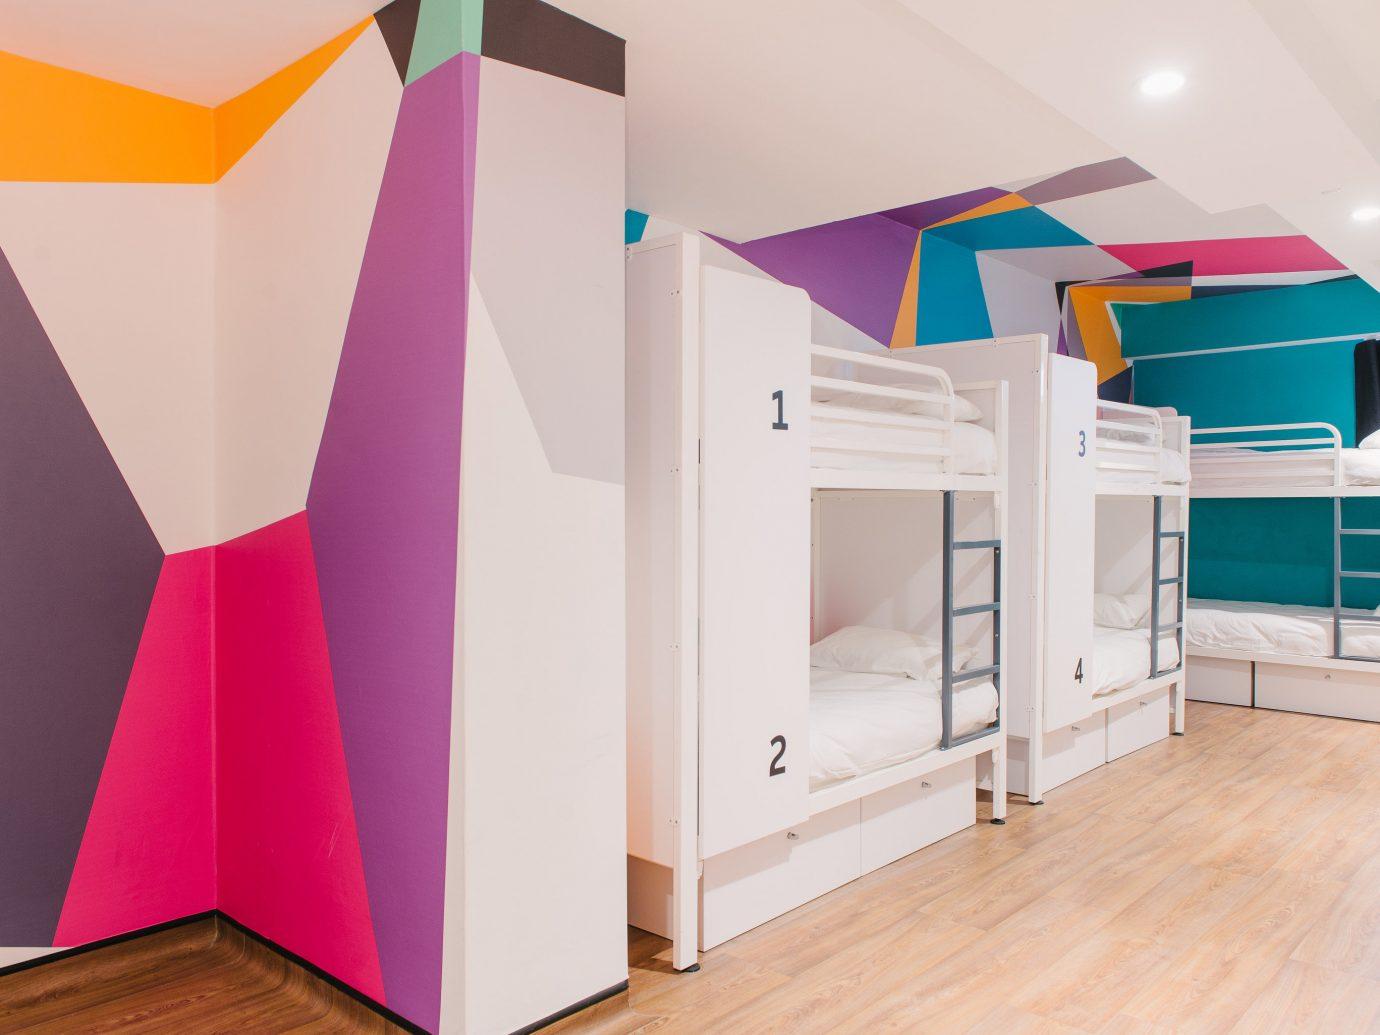 Budget Hotels London floor indoor color room interior design furniture bed home Design colored